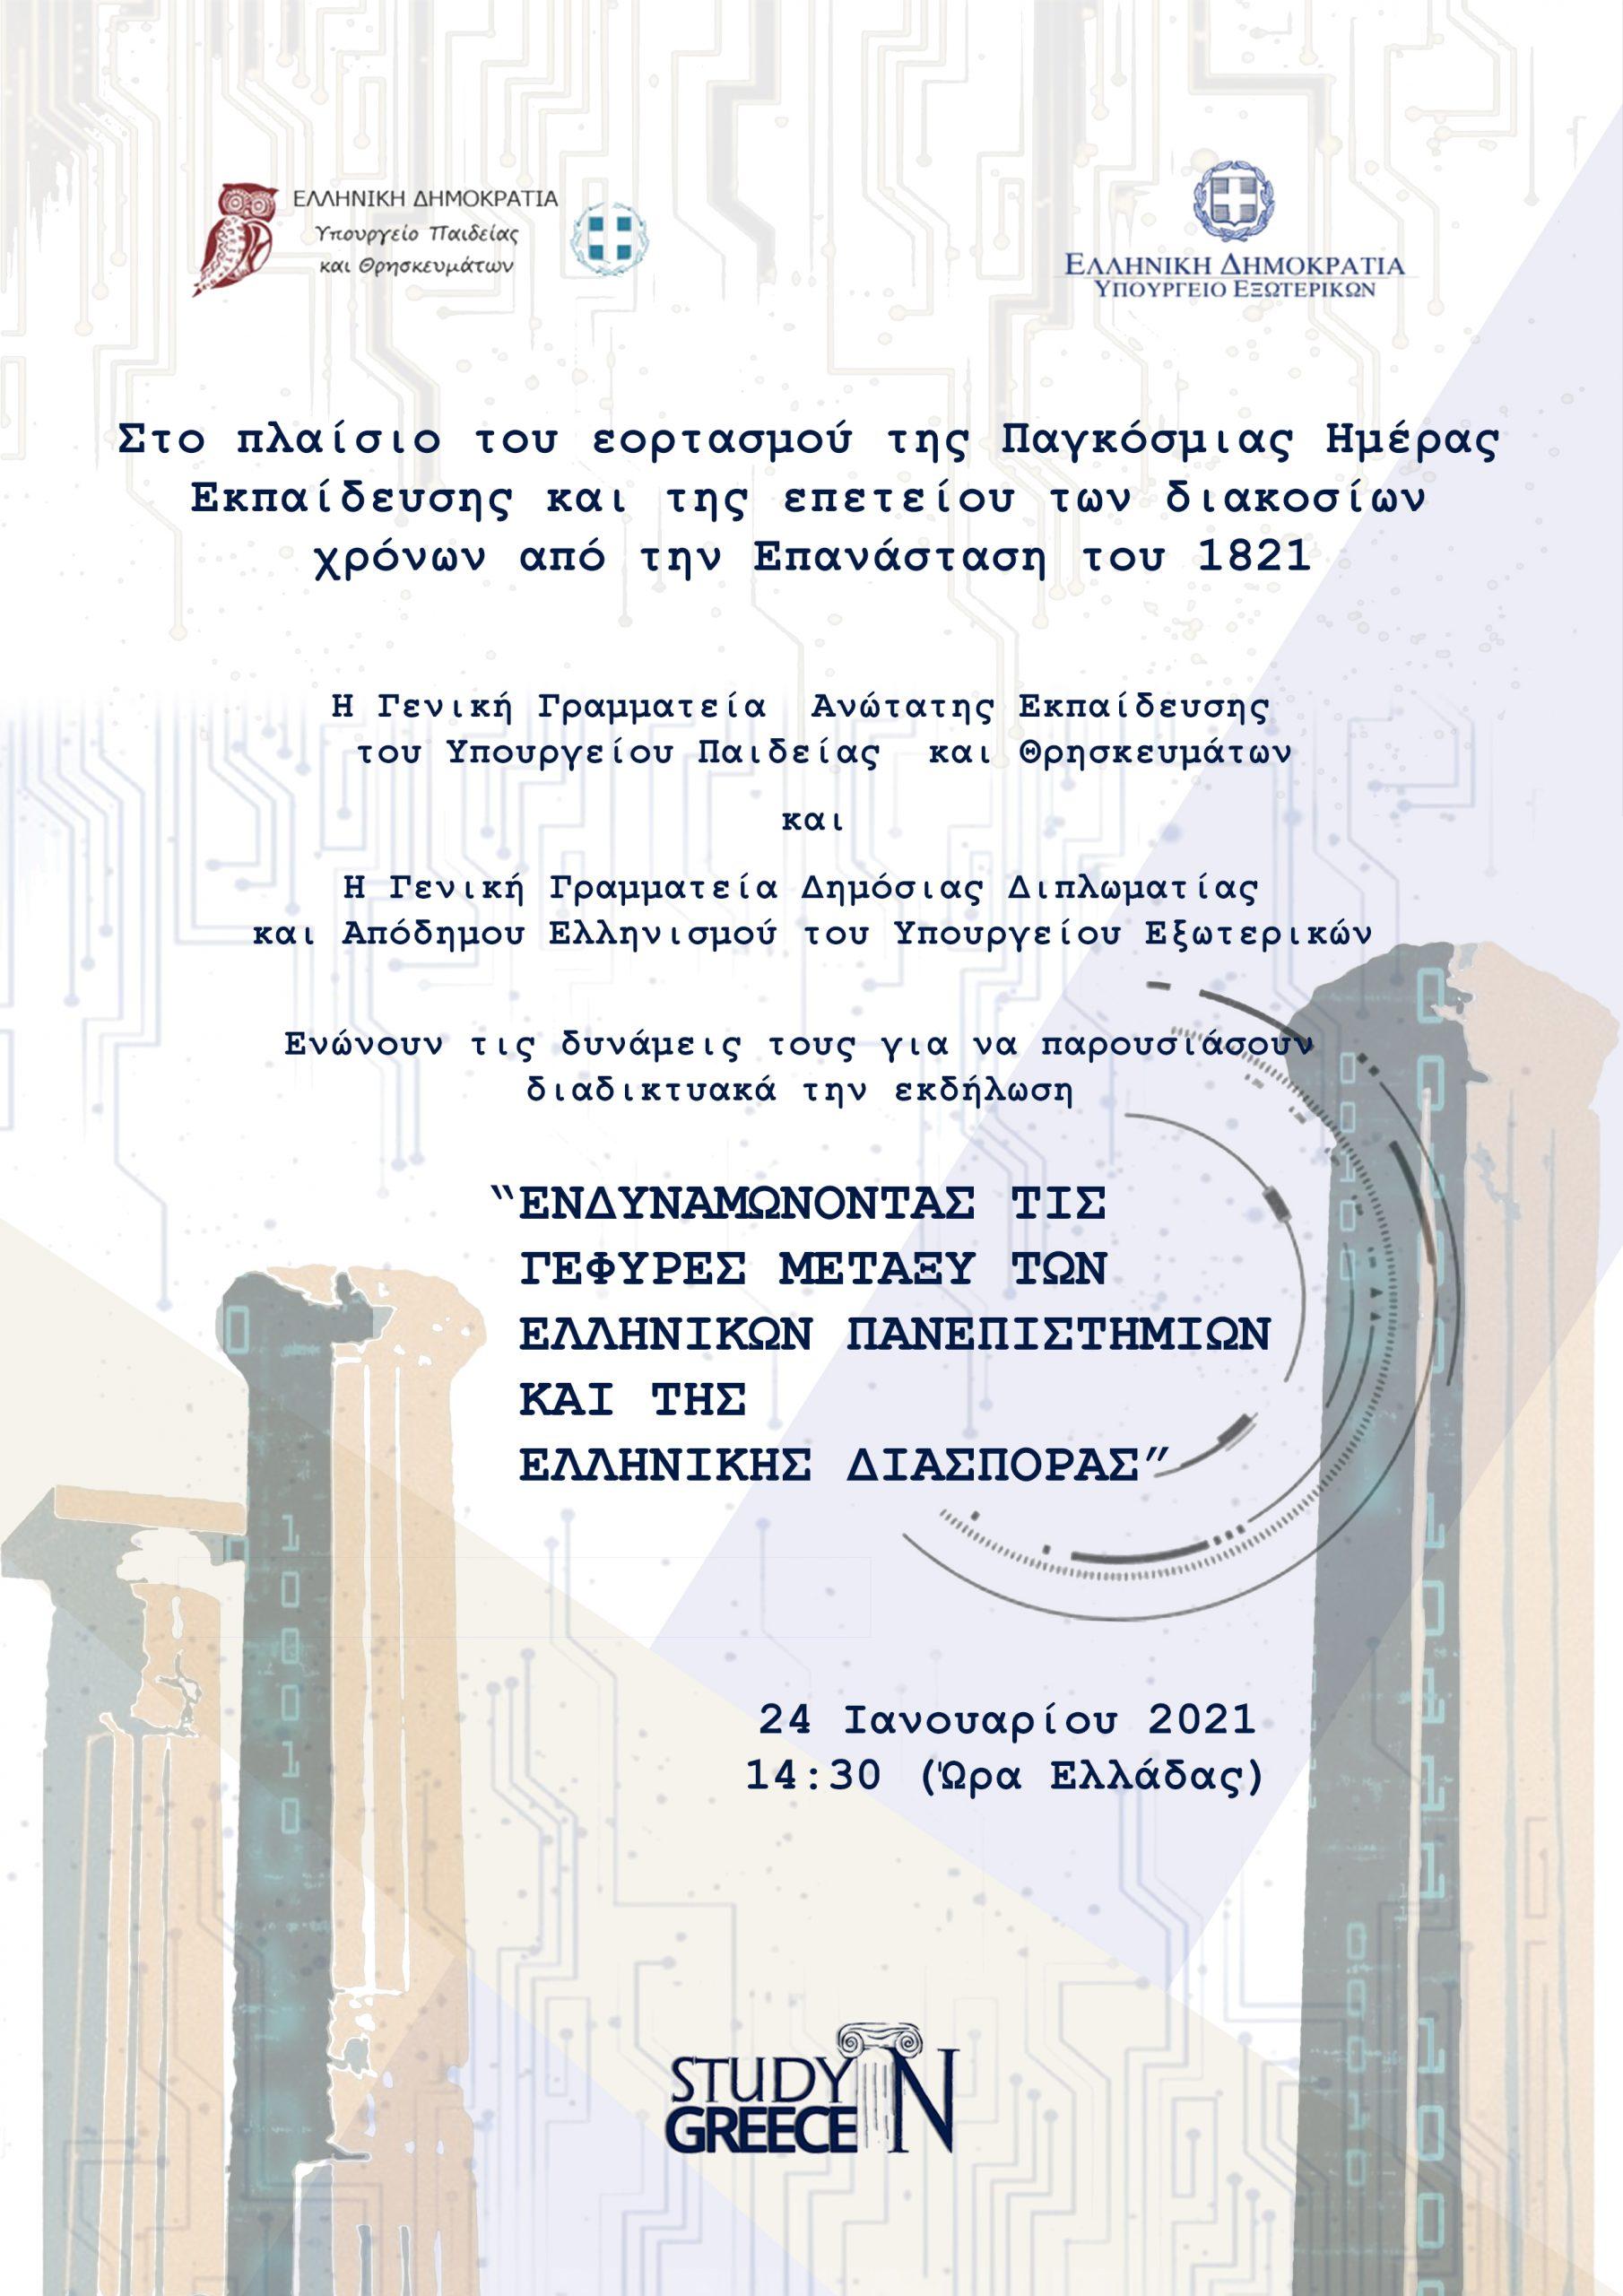 Reinforcing bridges between Greek Universities and the Greek Diaspora